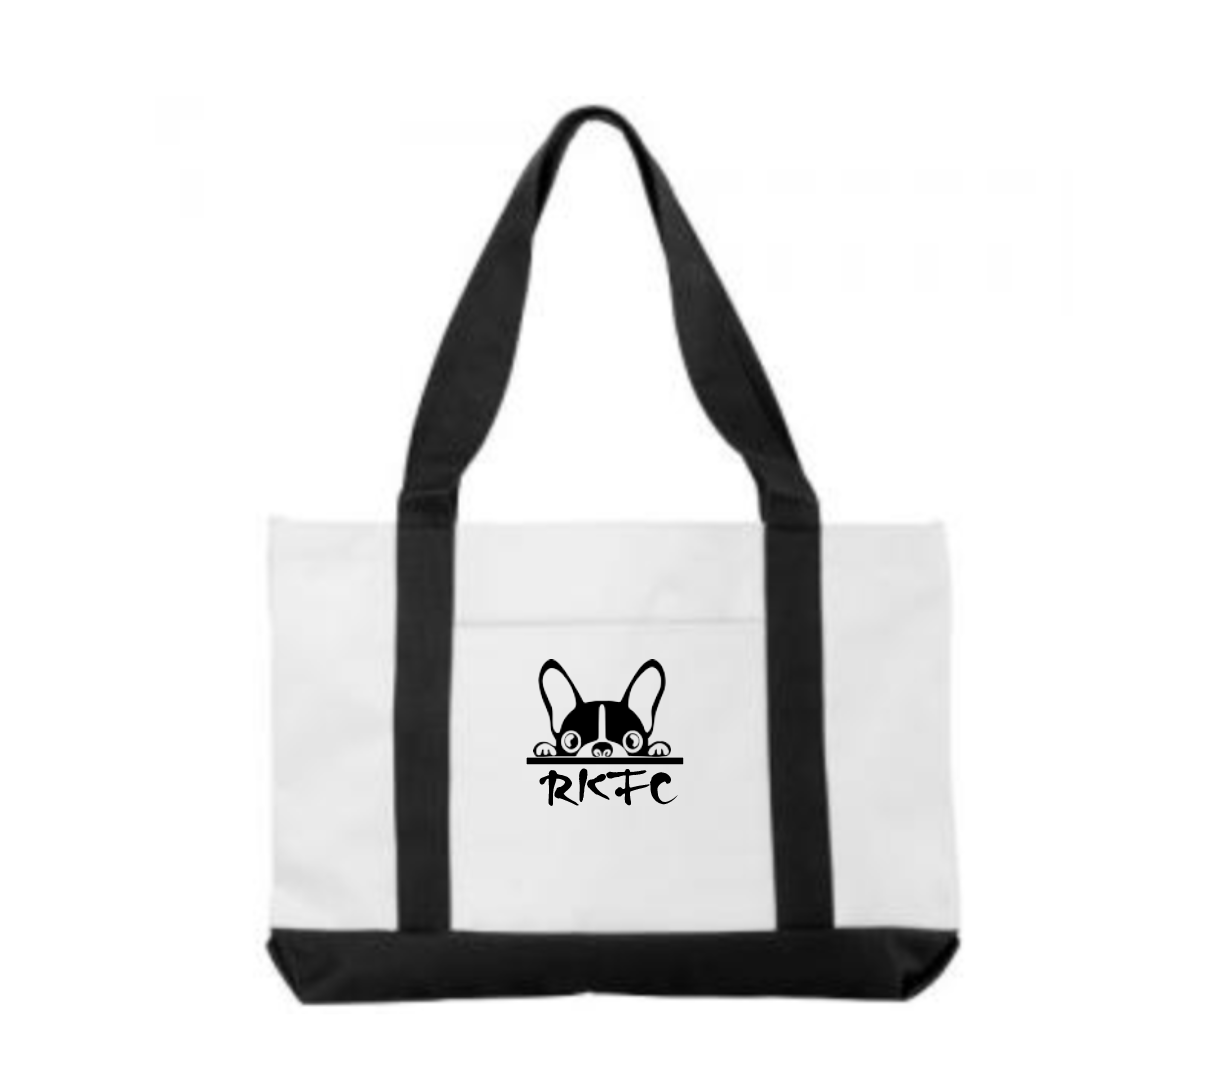 Image of RKFC TOTE BAG